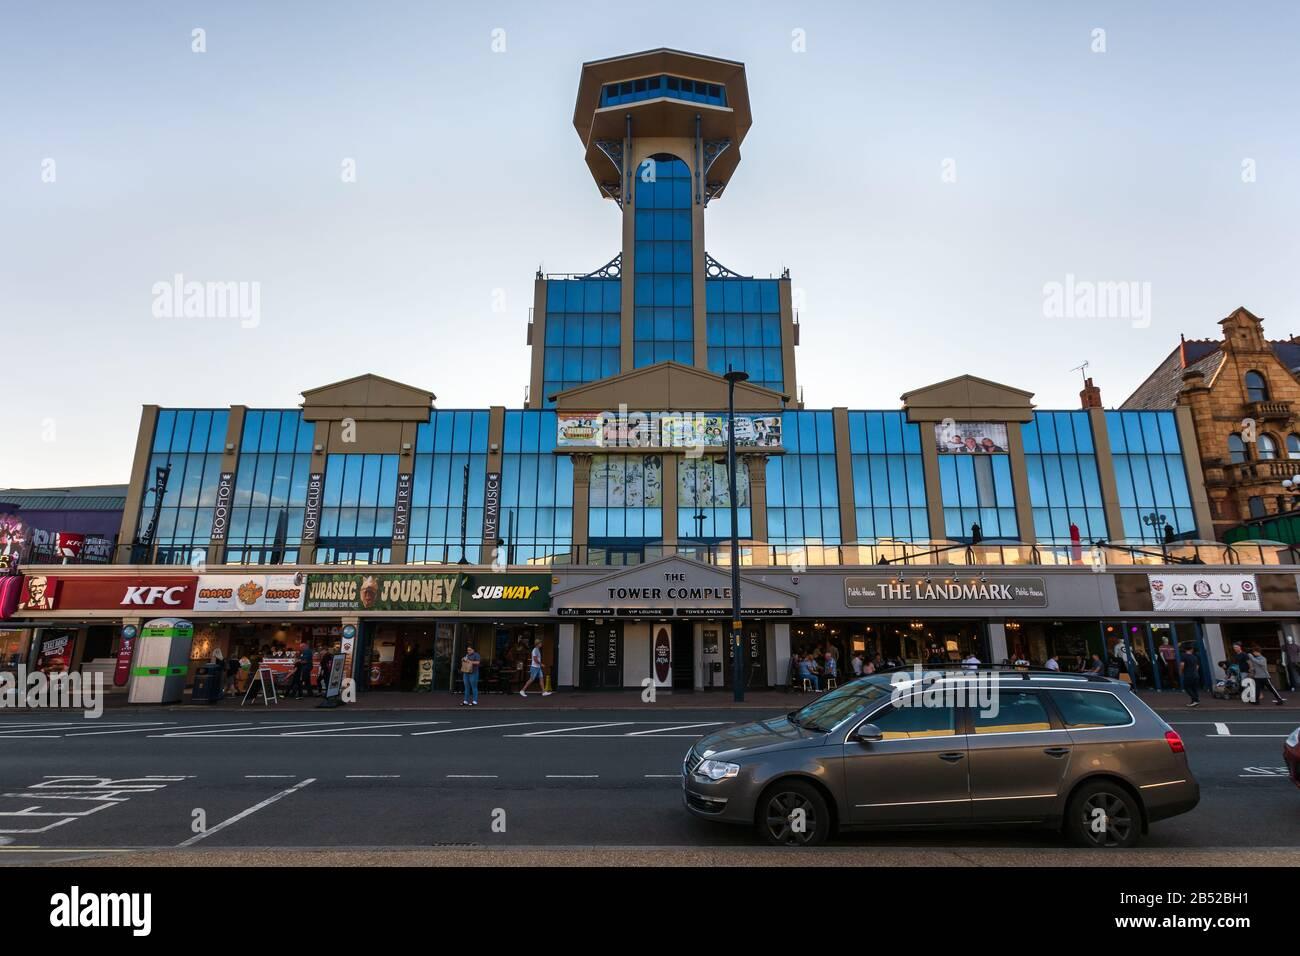 Weihnachten casino slots zimmer pharaonen weg update